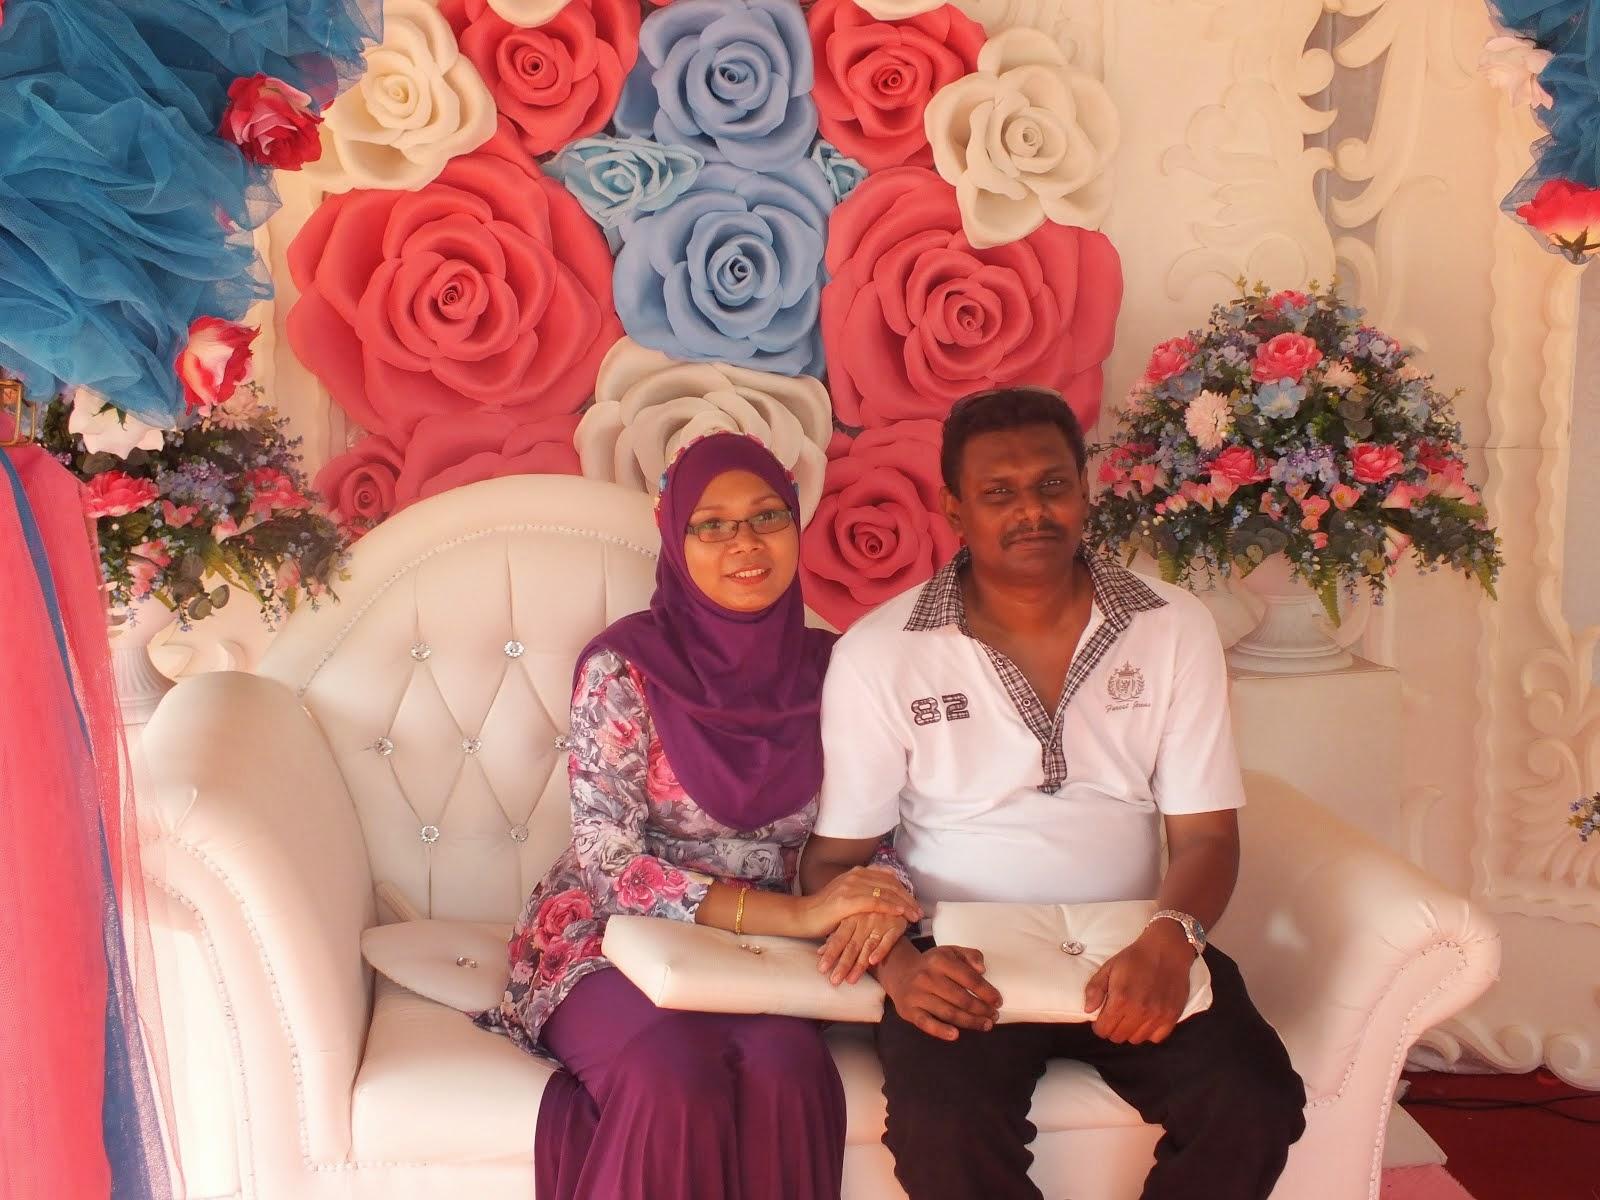 My Love & Me